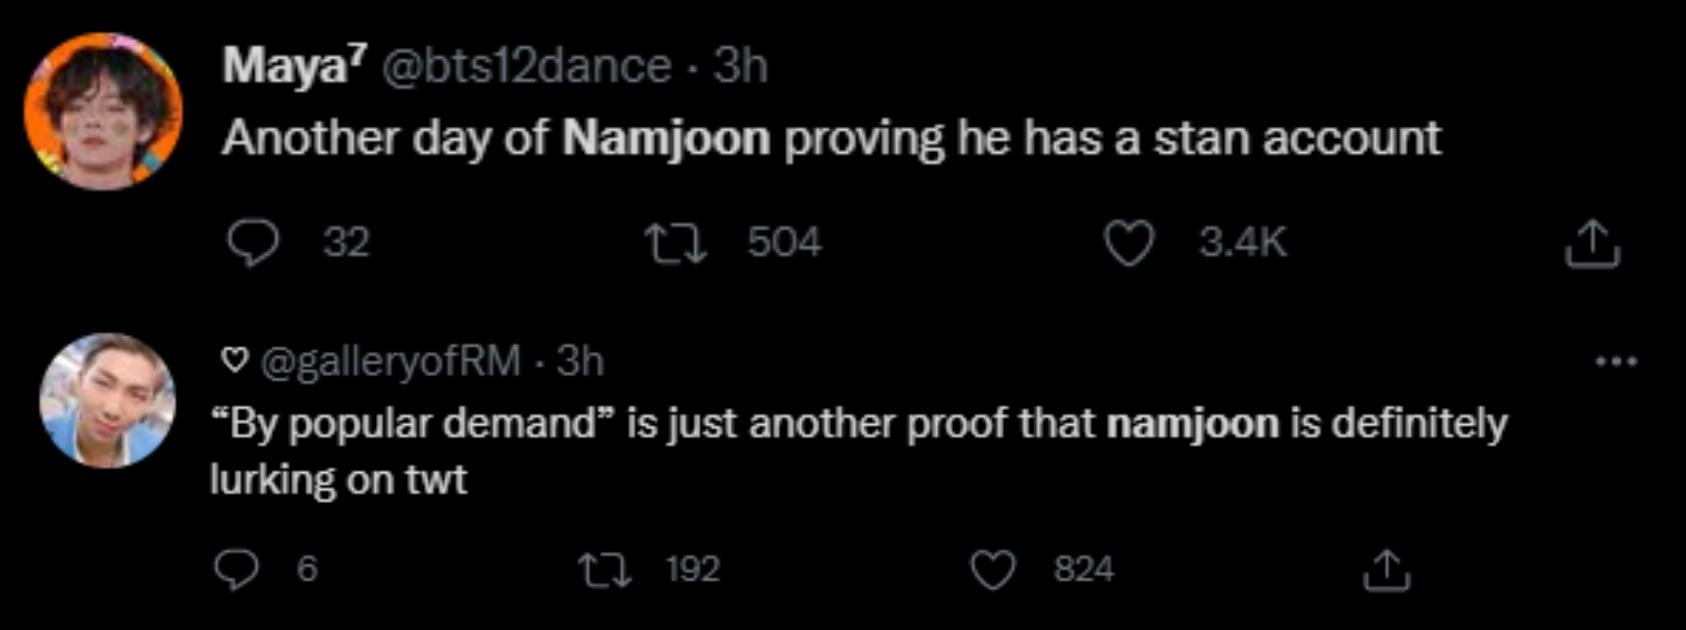 BTS 팬들은 RM이 비밀 계정을 가지고 있다고 생각합니다.